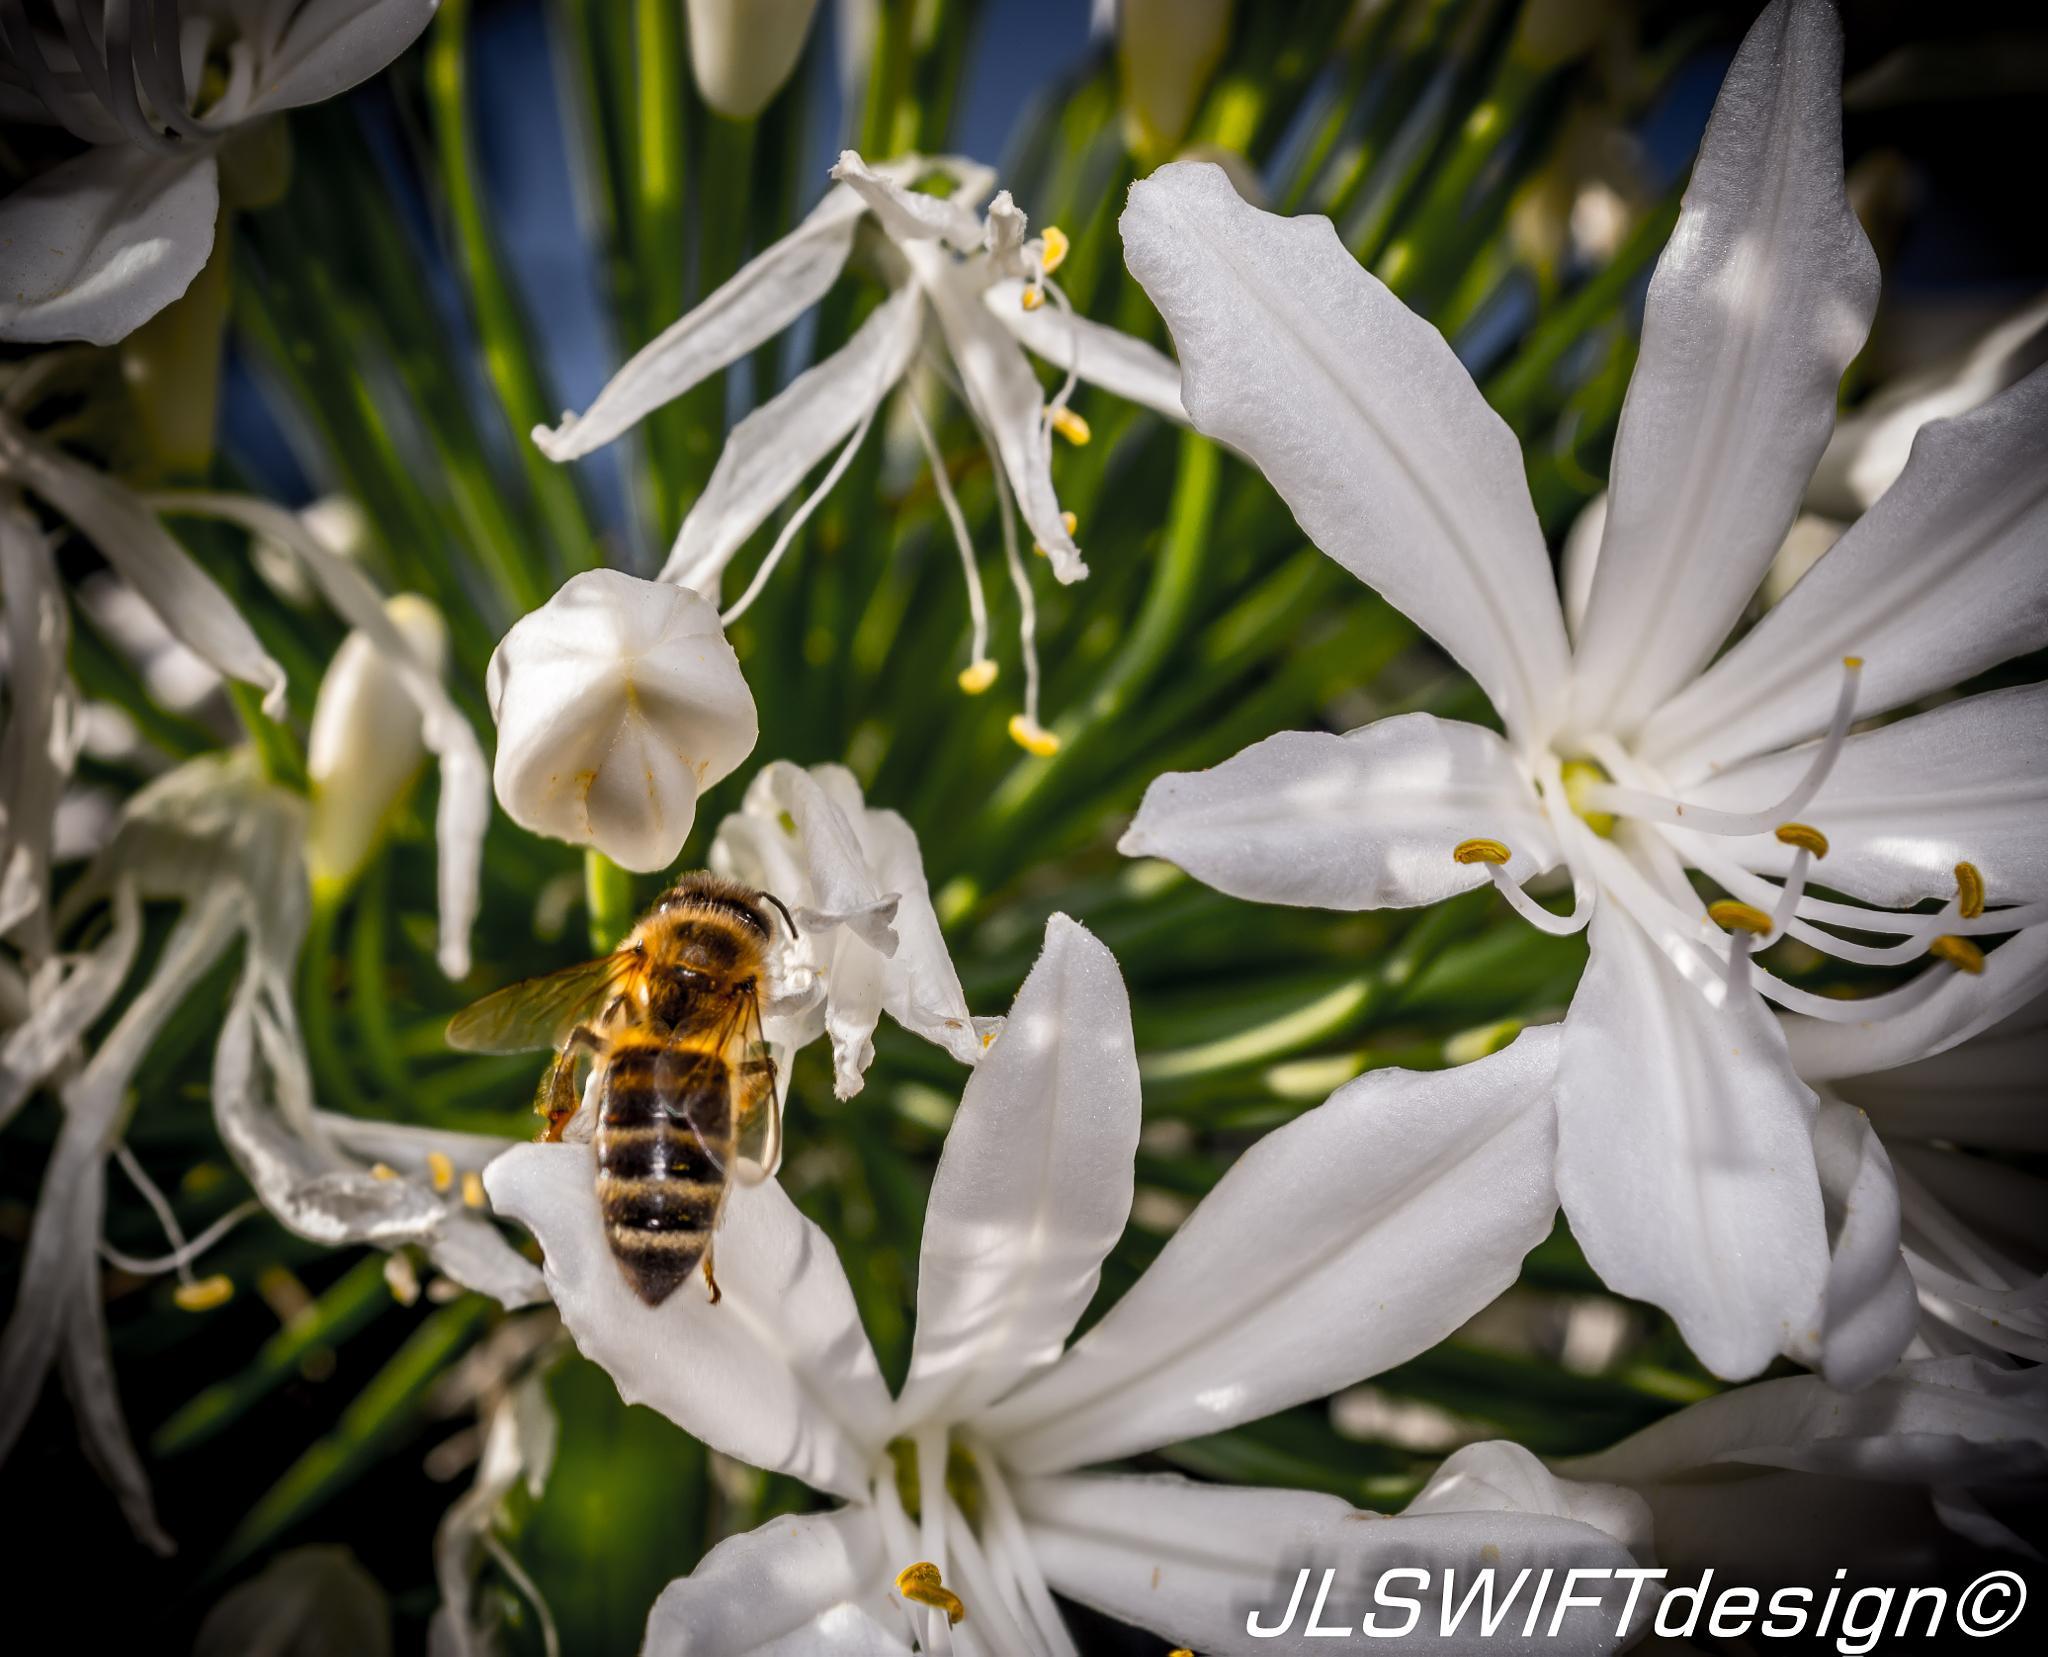 Bees_and_Flower000 photo Jordan Lia JLSWIFTdesign  by JLSWIFTdesign